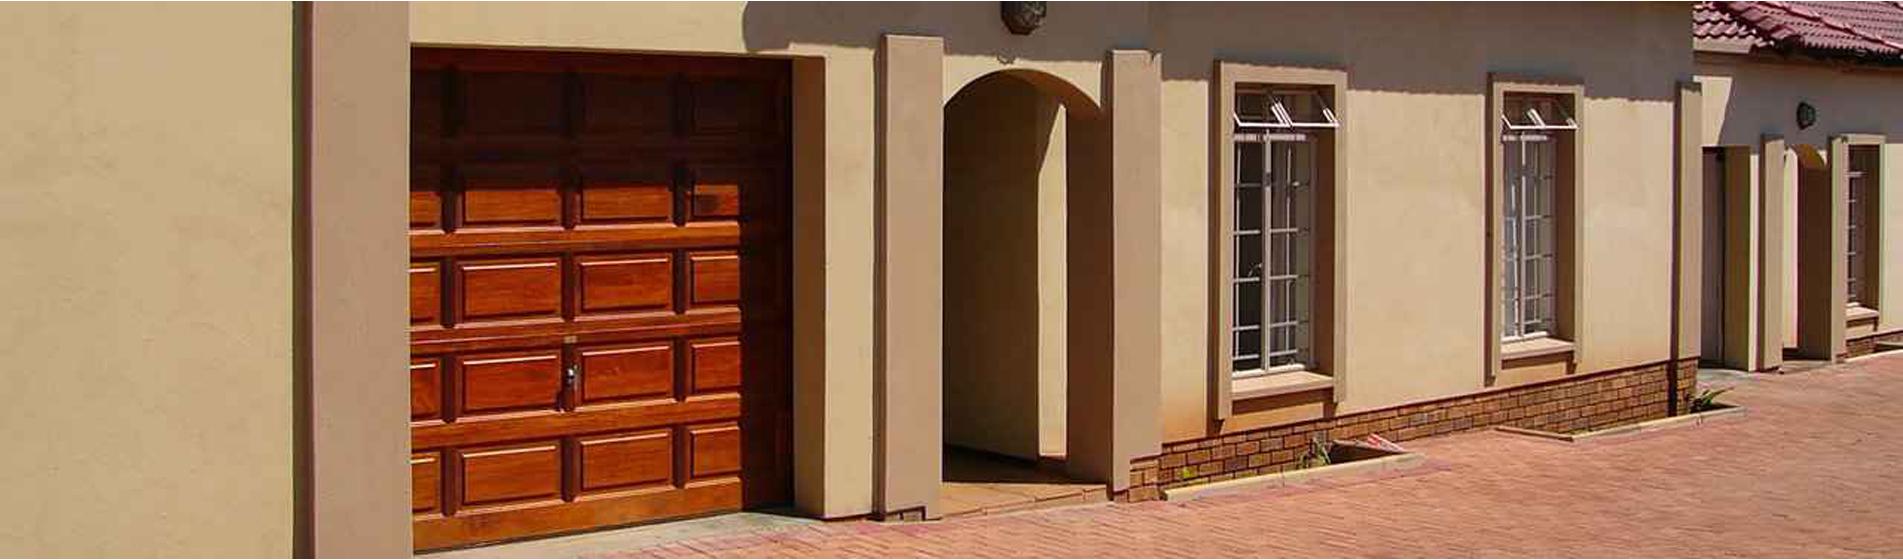 installer porte de garage alu Avignon